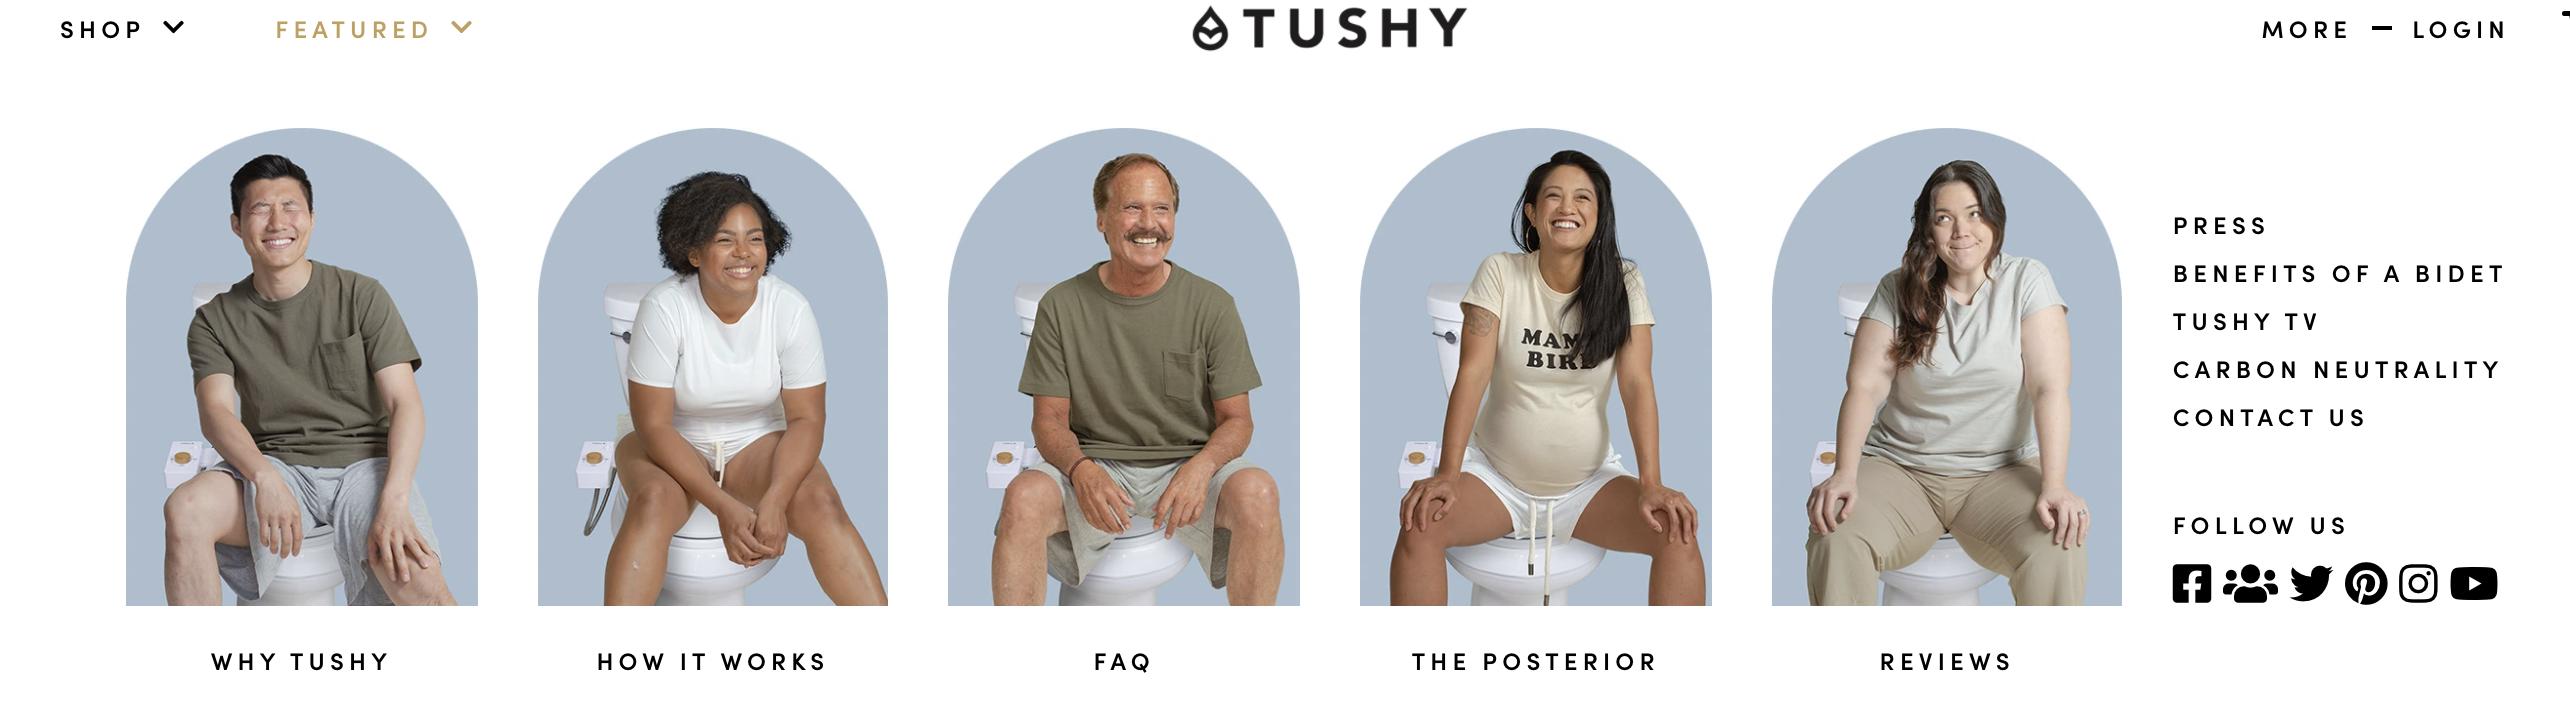 Image of five Tushy customers